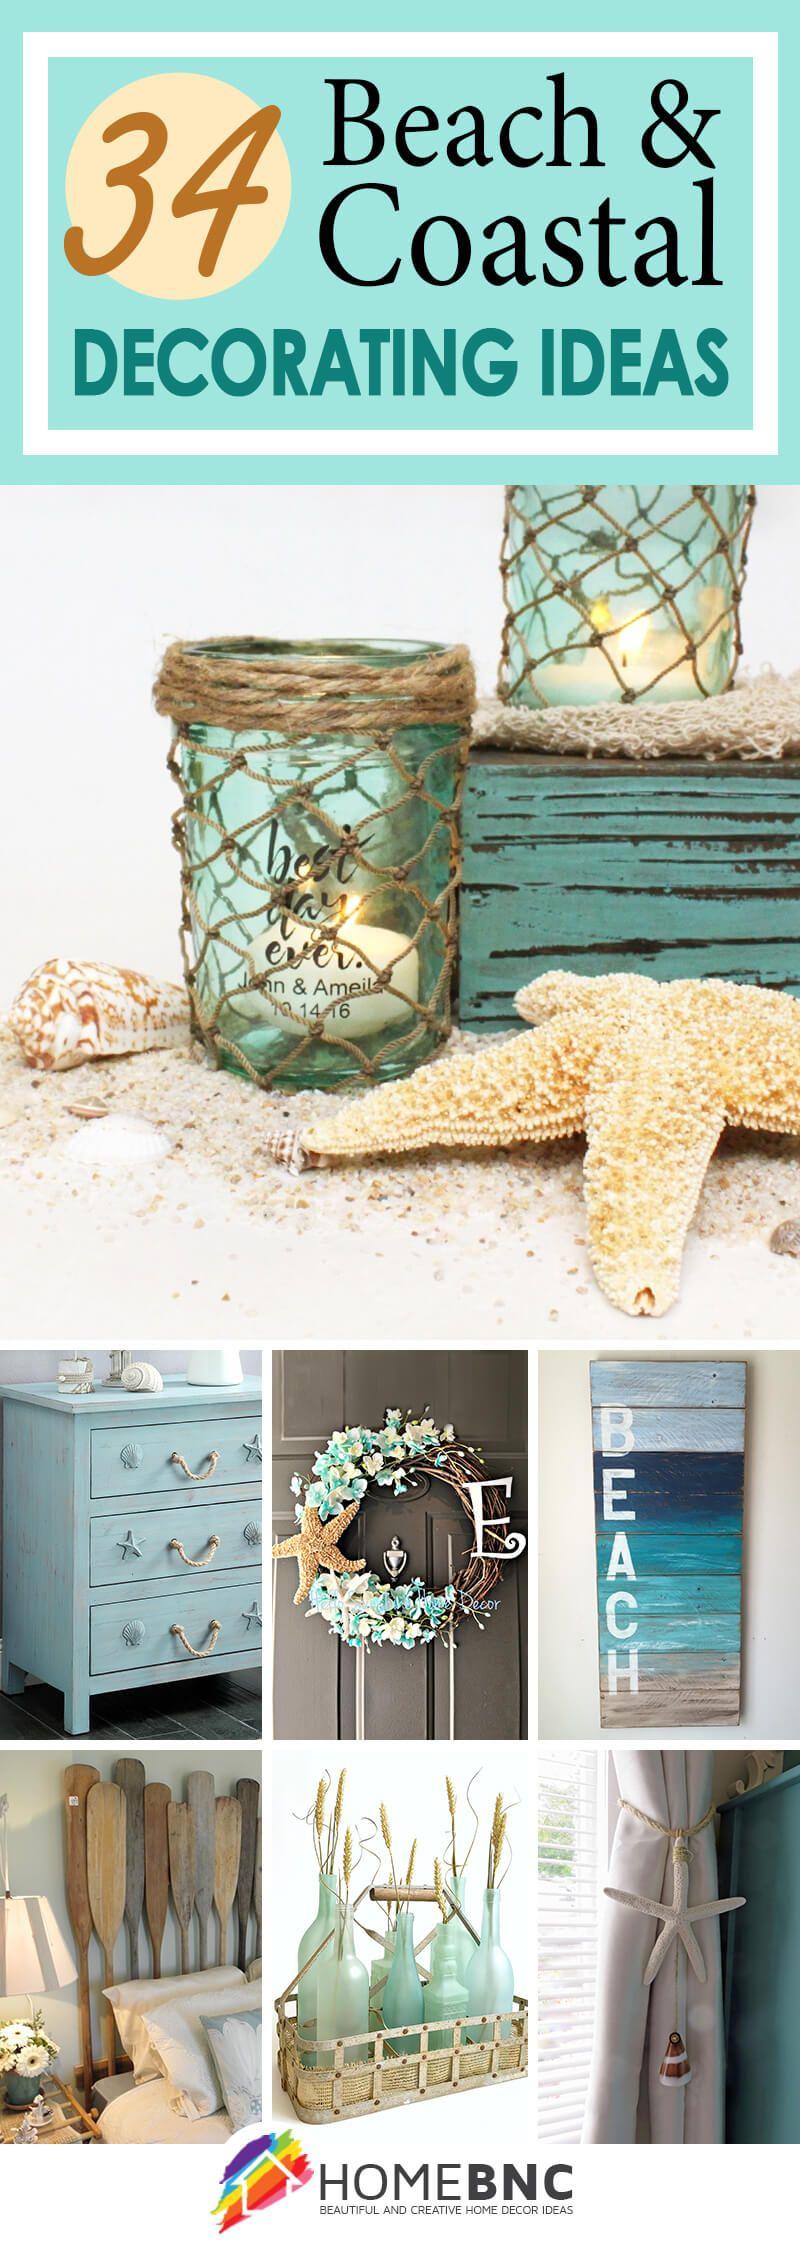 Coastal bathroom ideas - 34 Beach And Coastal Decorating Ideas You Ll Adore